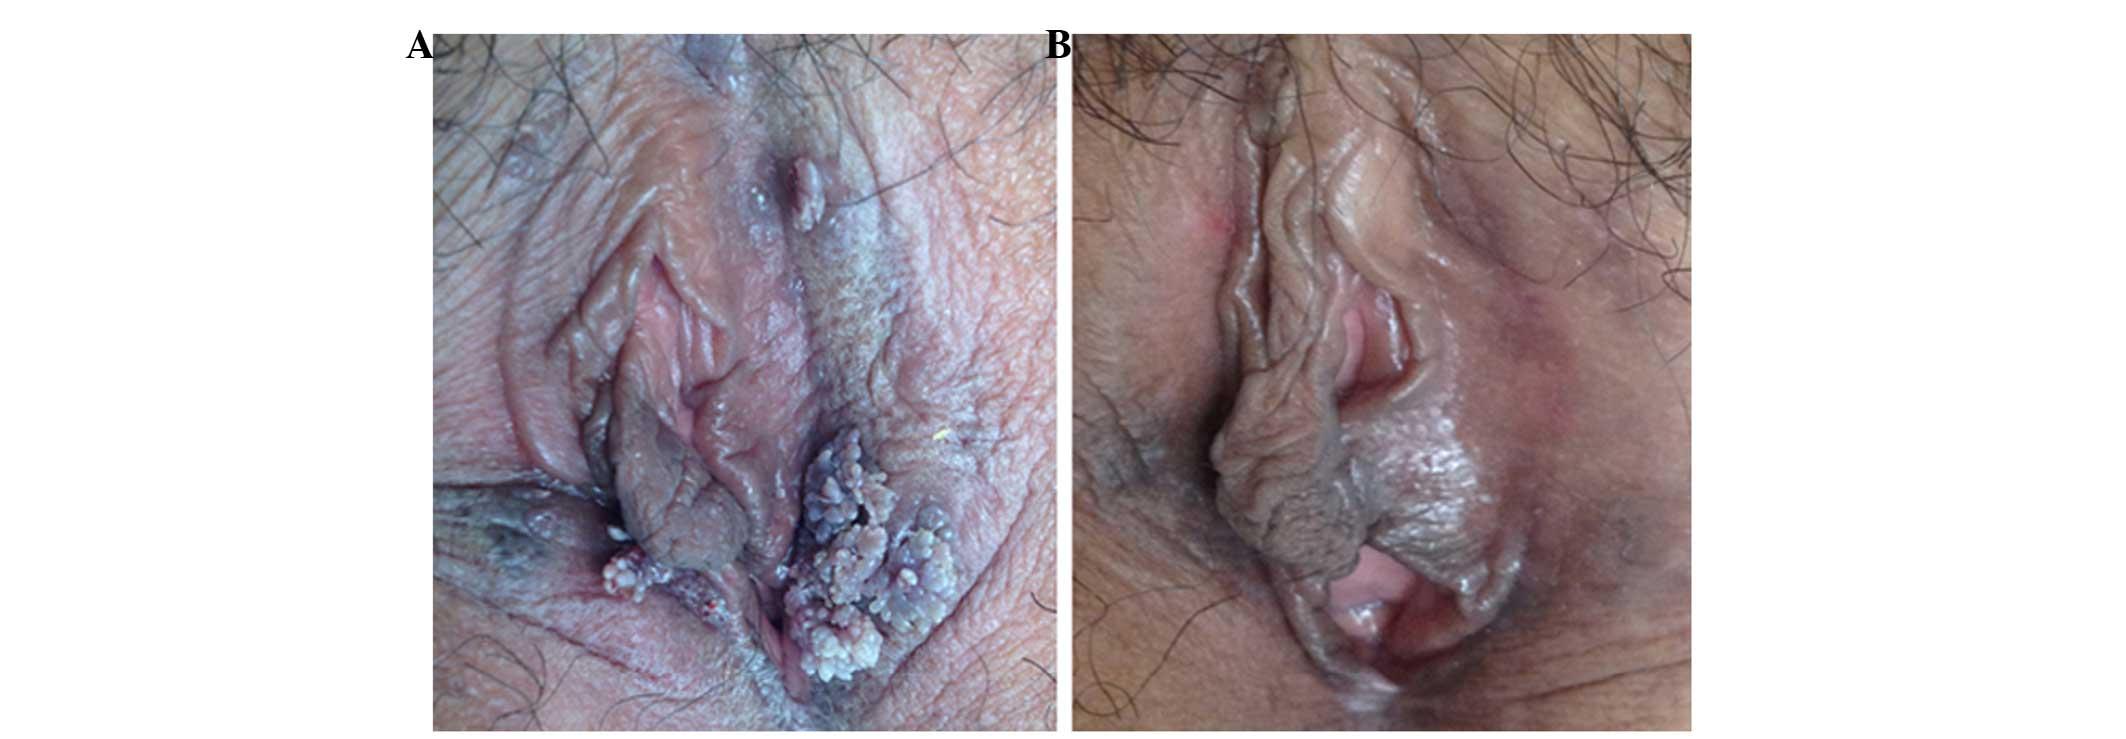 condyloma acuminata and pregnancy